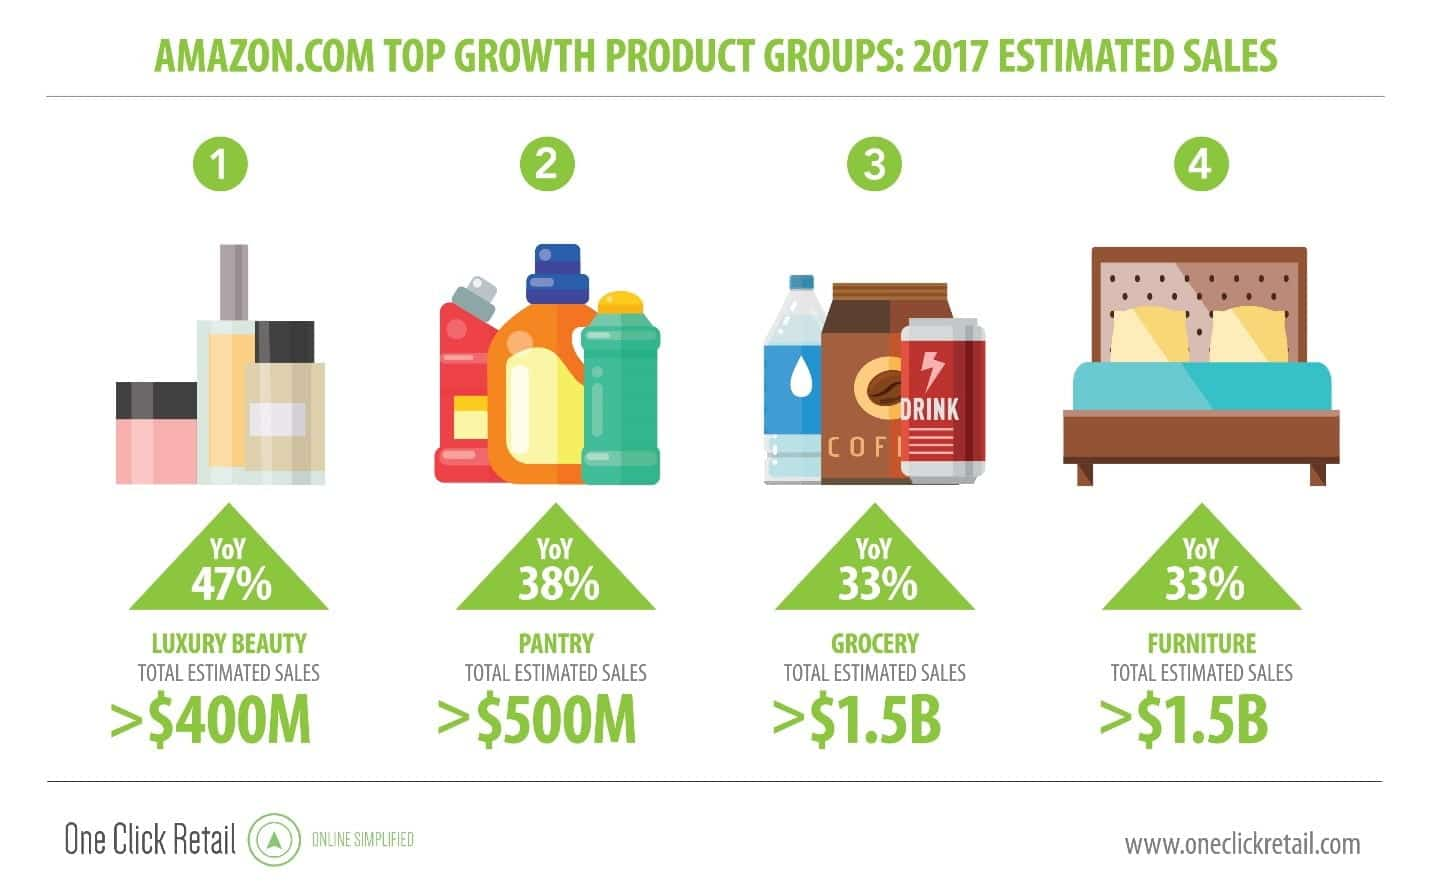 Snelstgroeiende producten Amazon